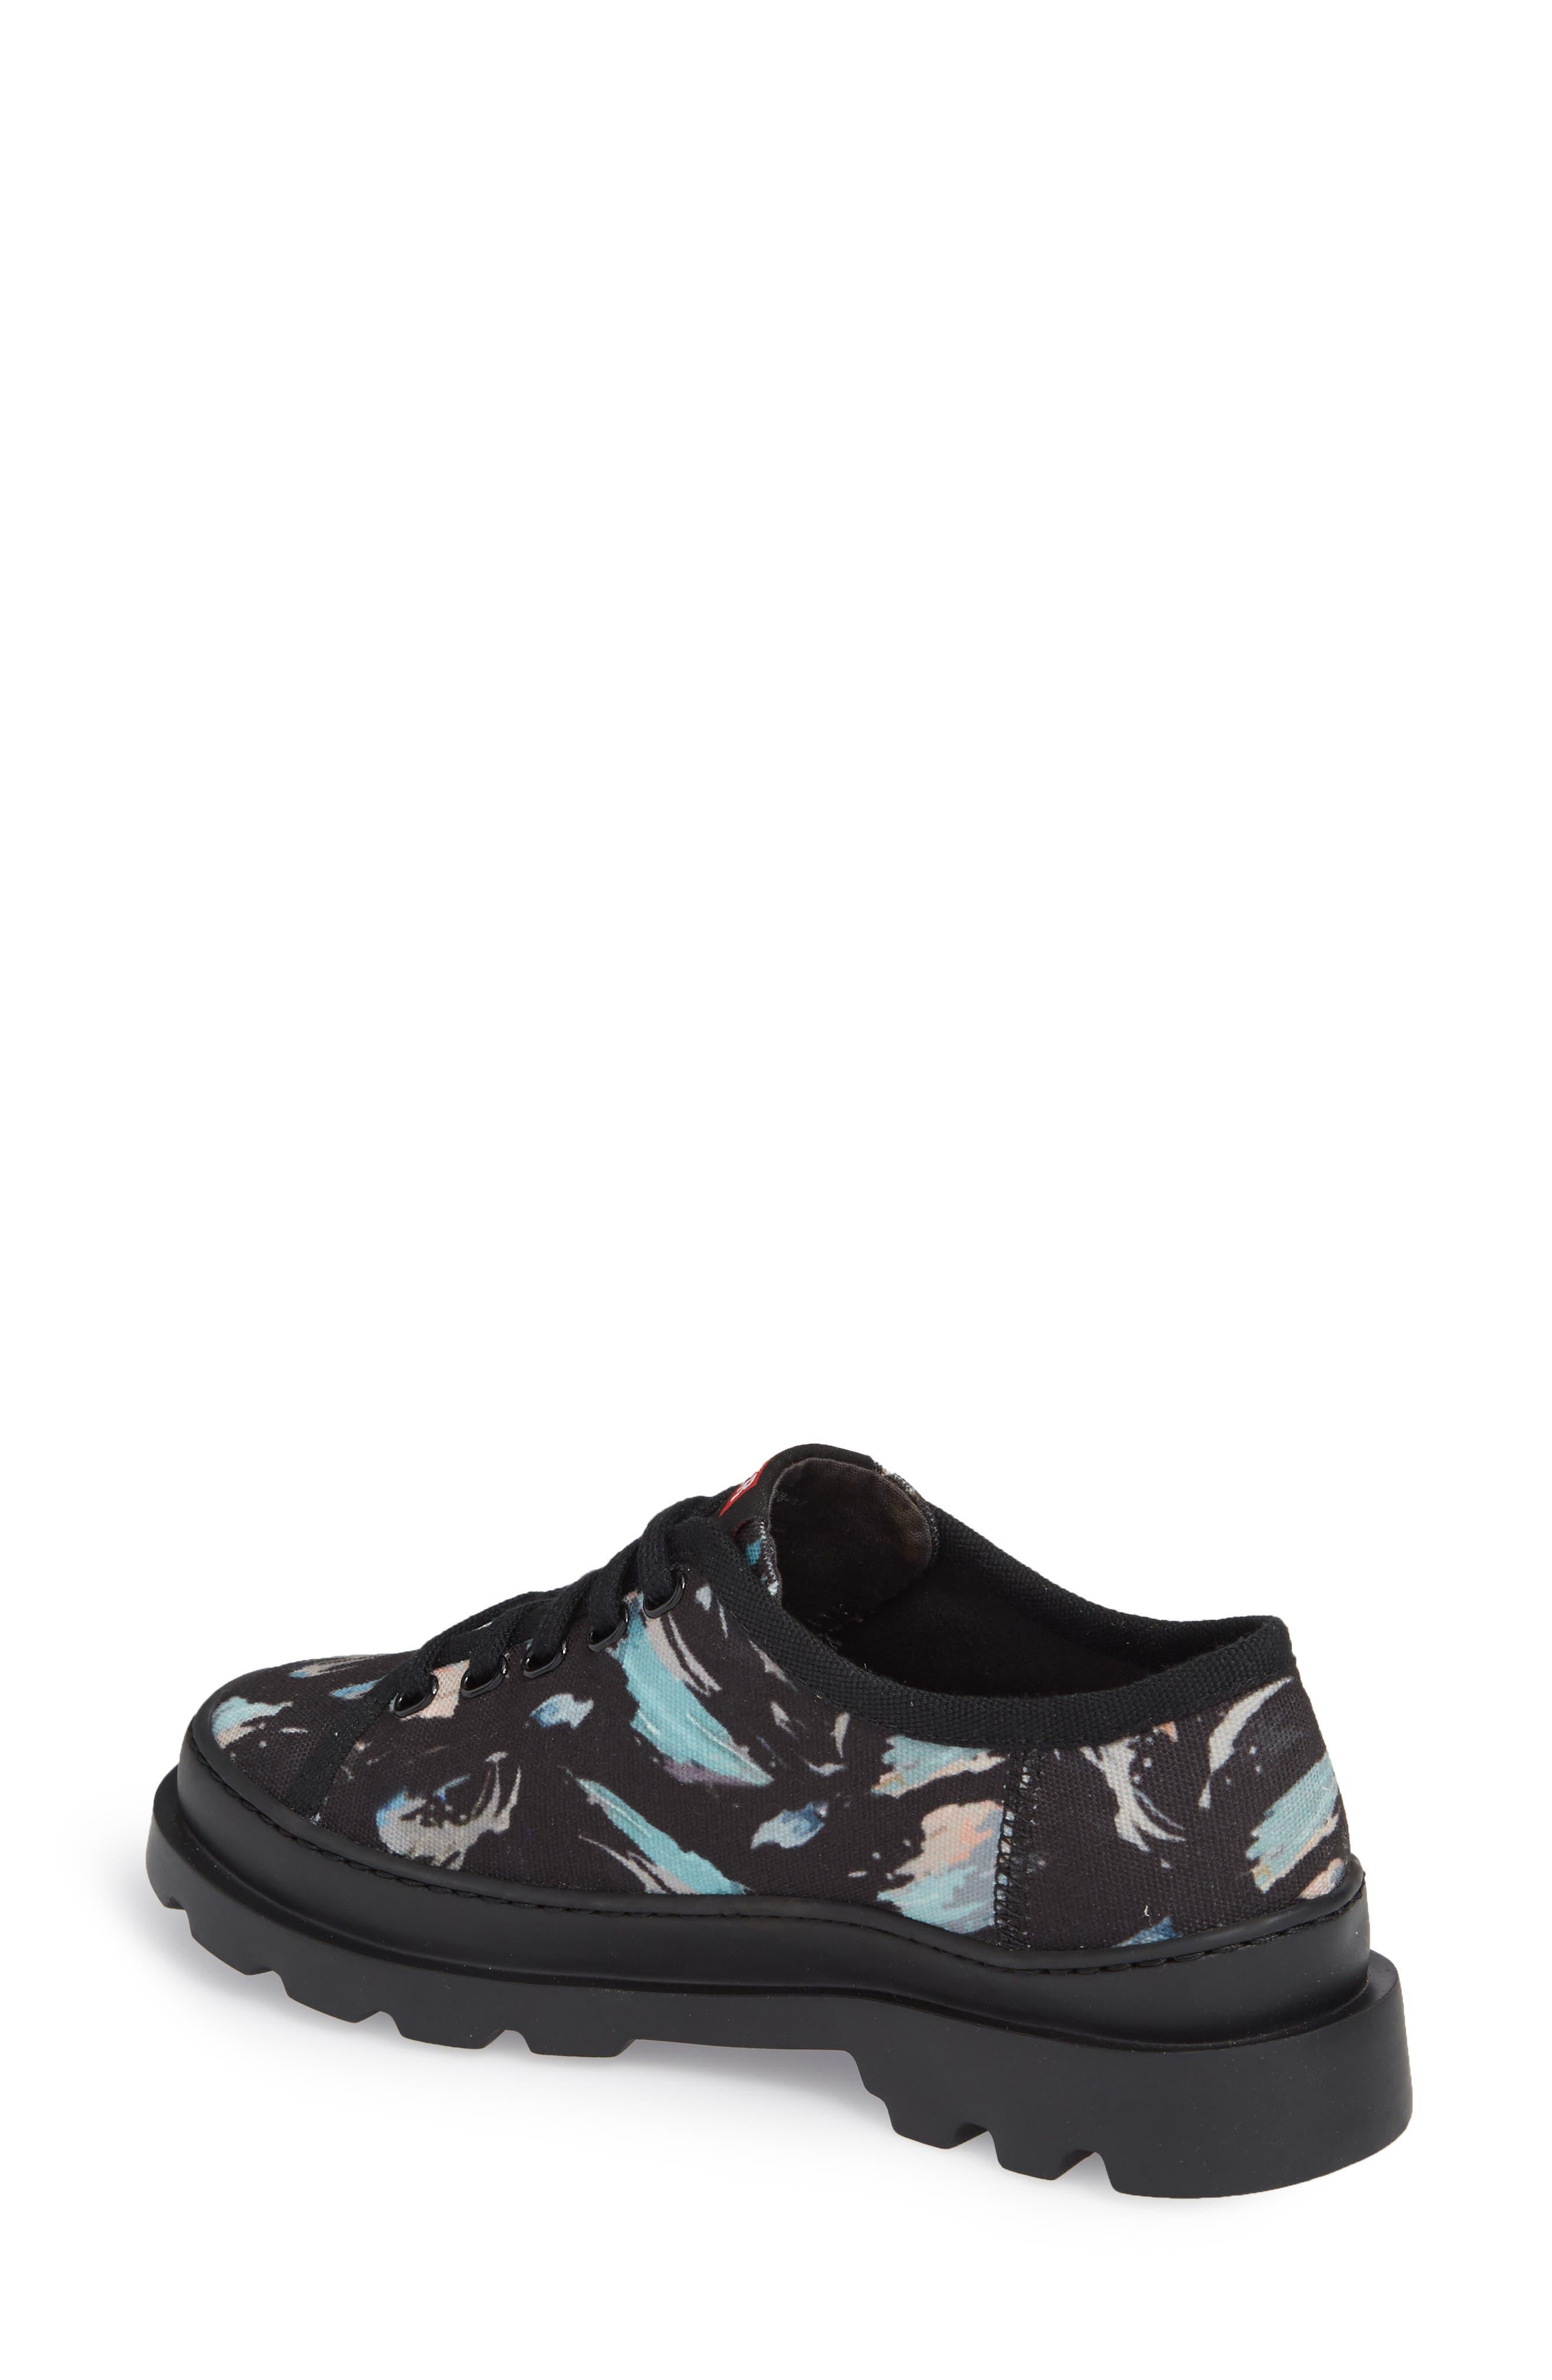 Brutus Lugged Platform Sneaker,                             Alternate thumbnail 2, color,                             Black Multi